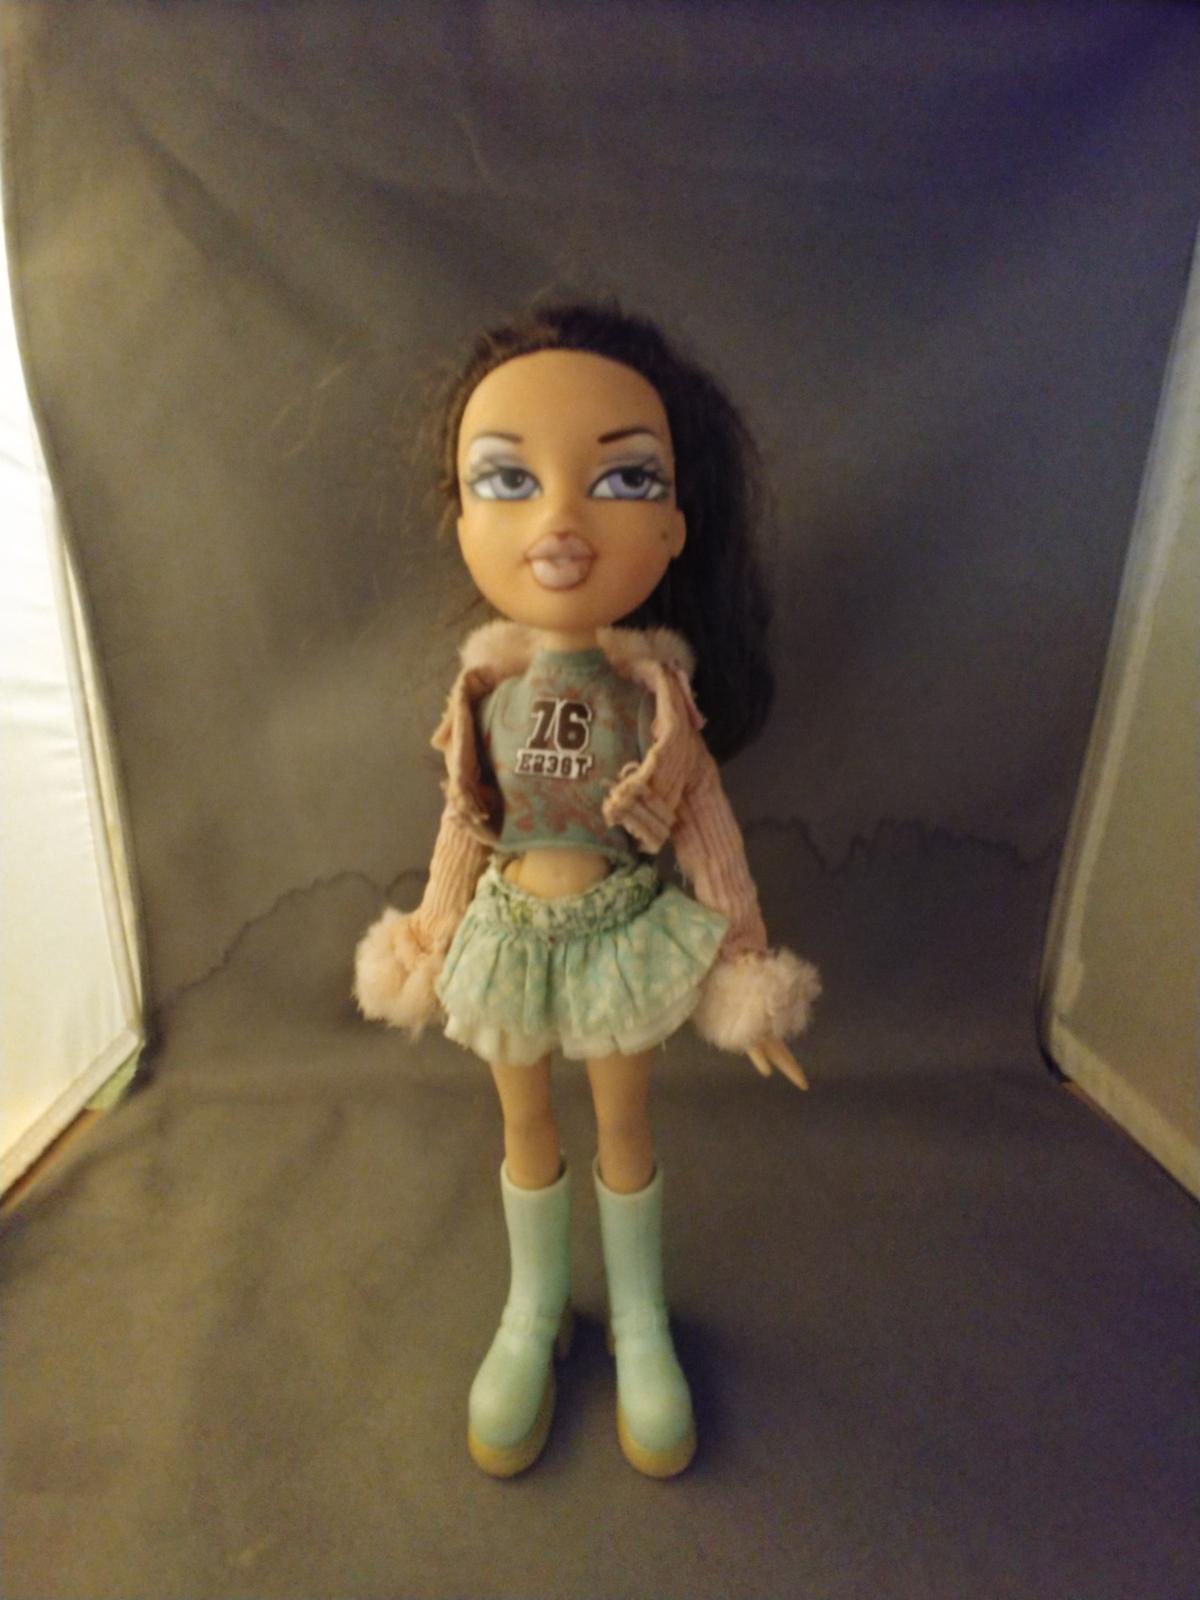 Bratz Doll Yasmin Brown Hair with outfit 2001 MGA - $8.00